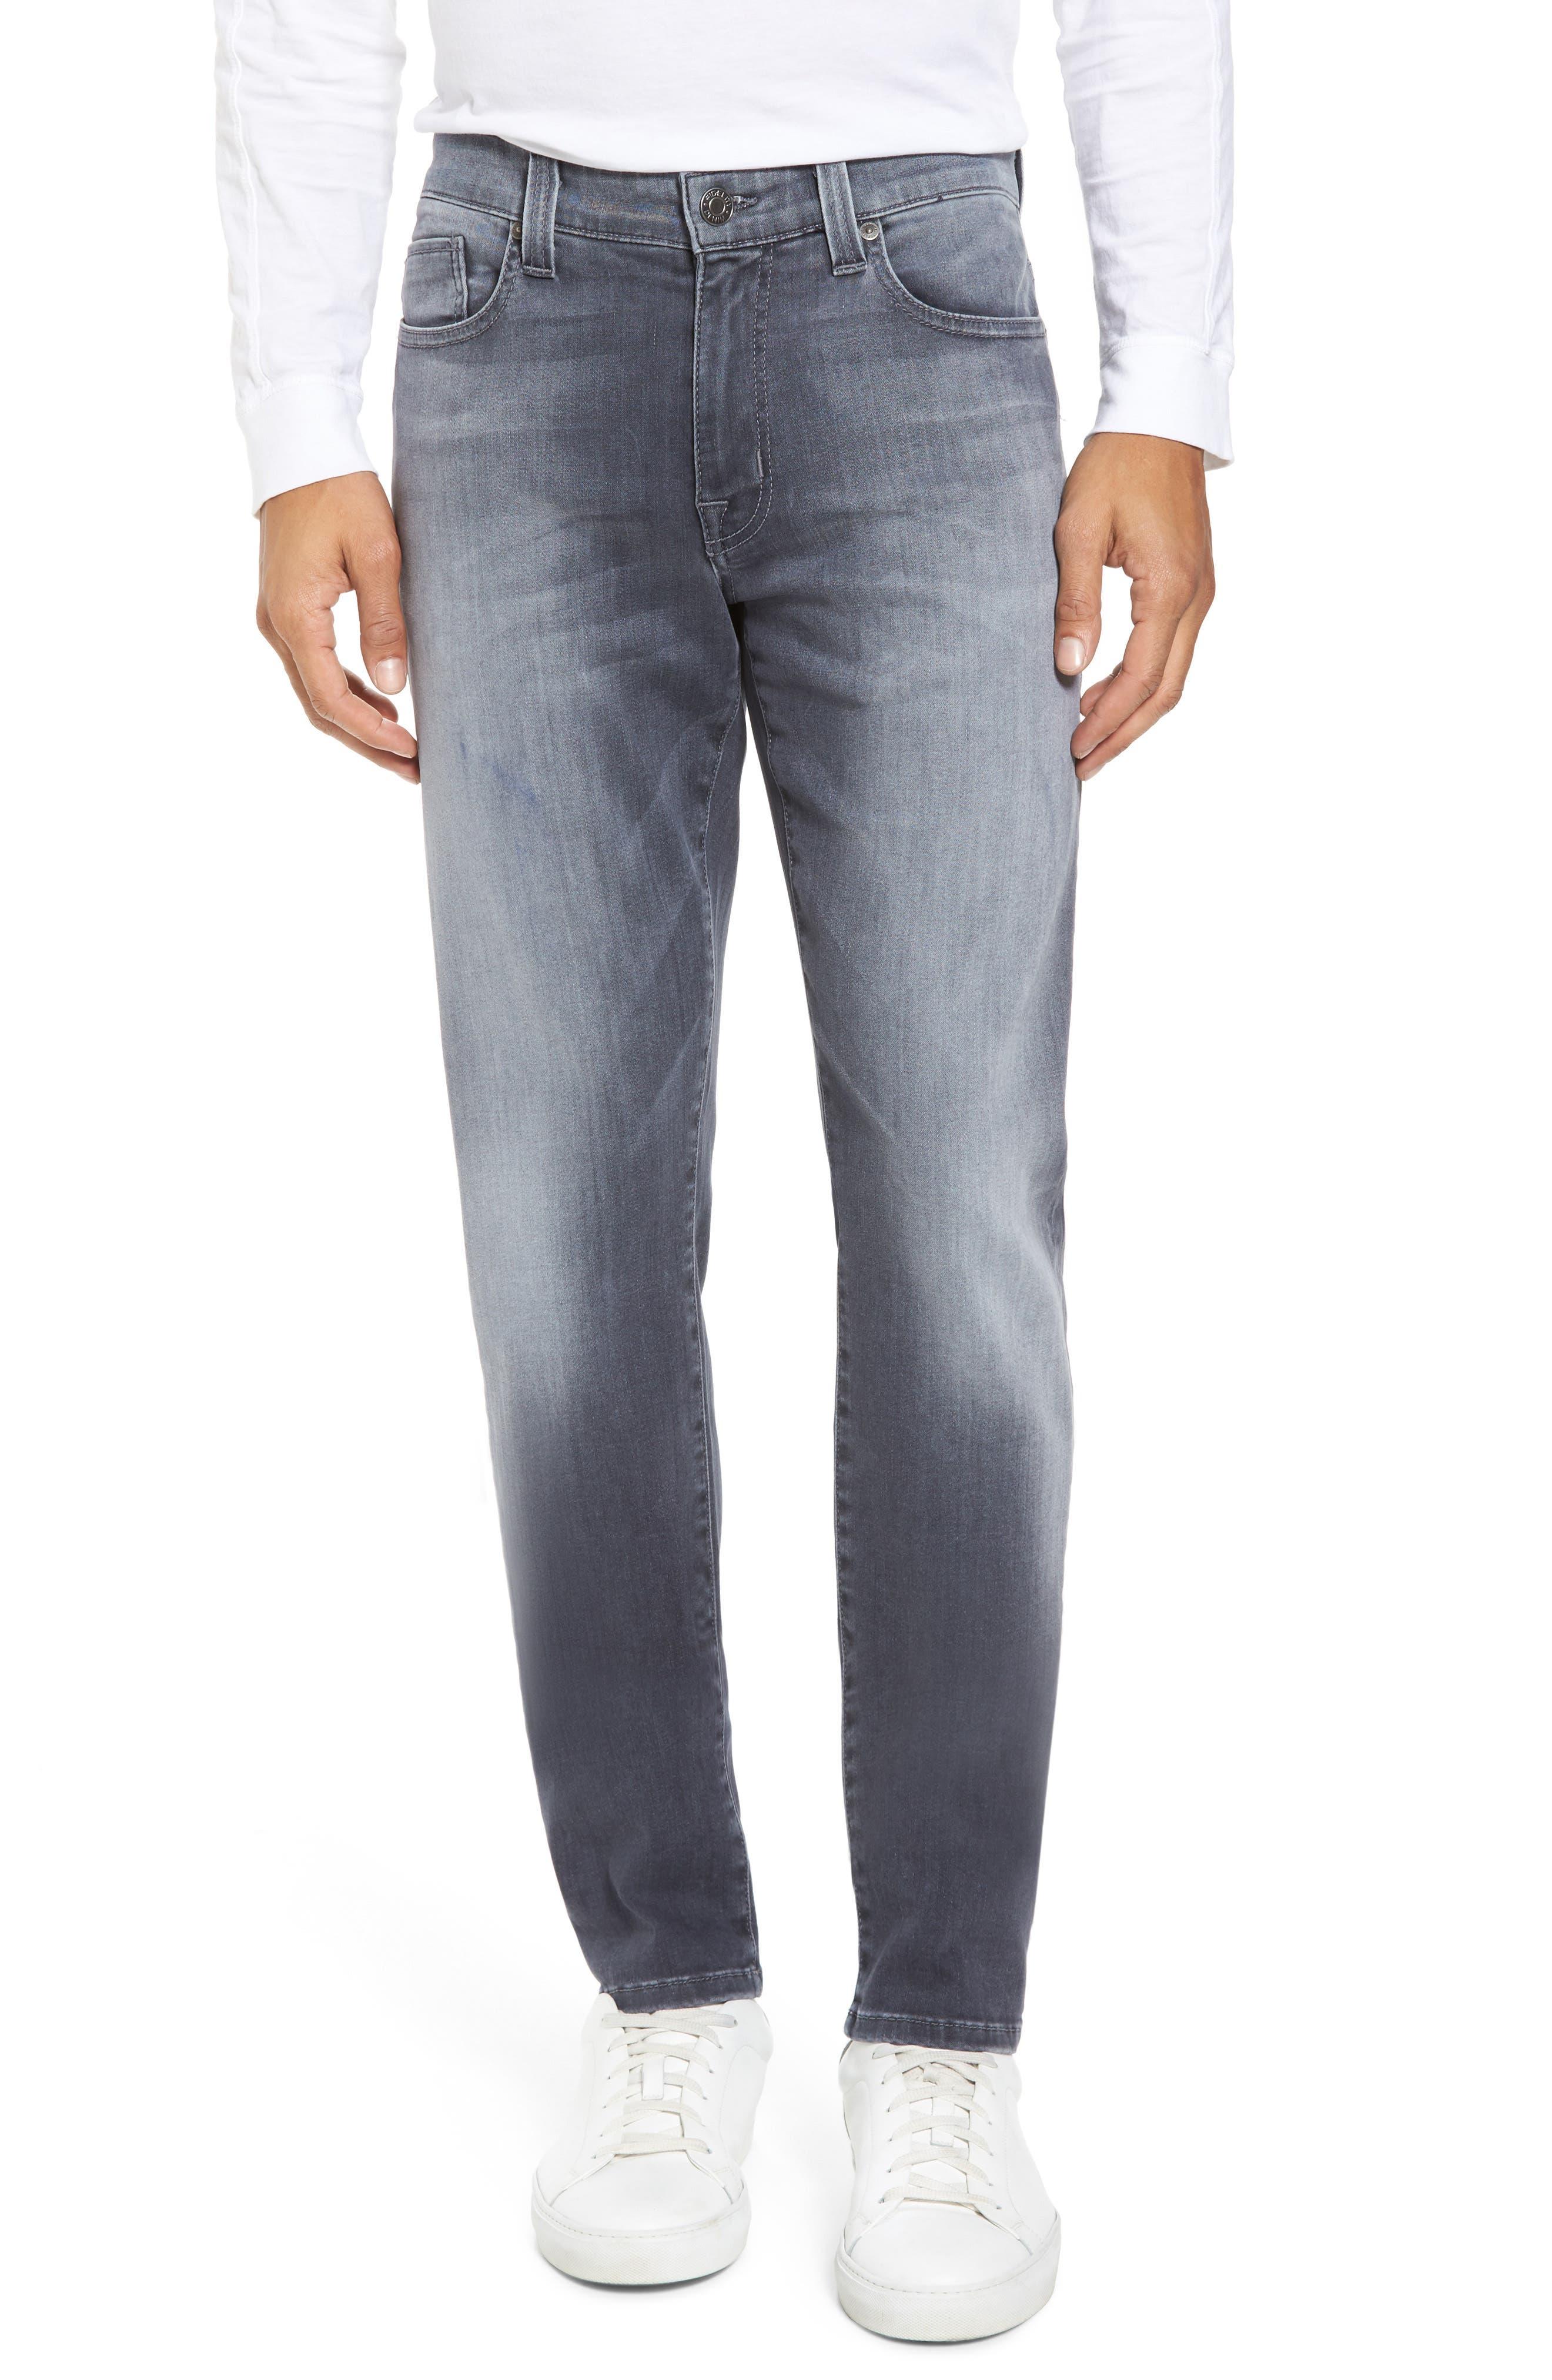 Torino Slim Fit Jeans,                         Main,                         color, 020